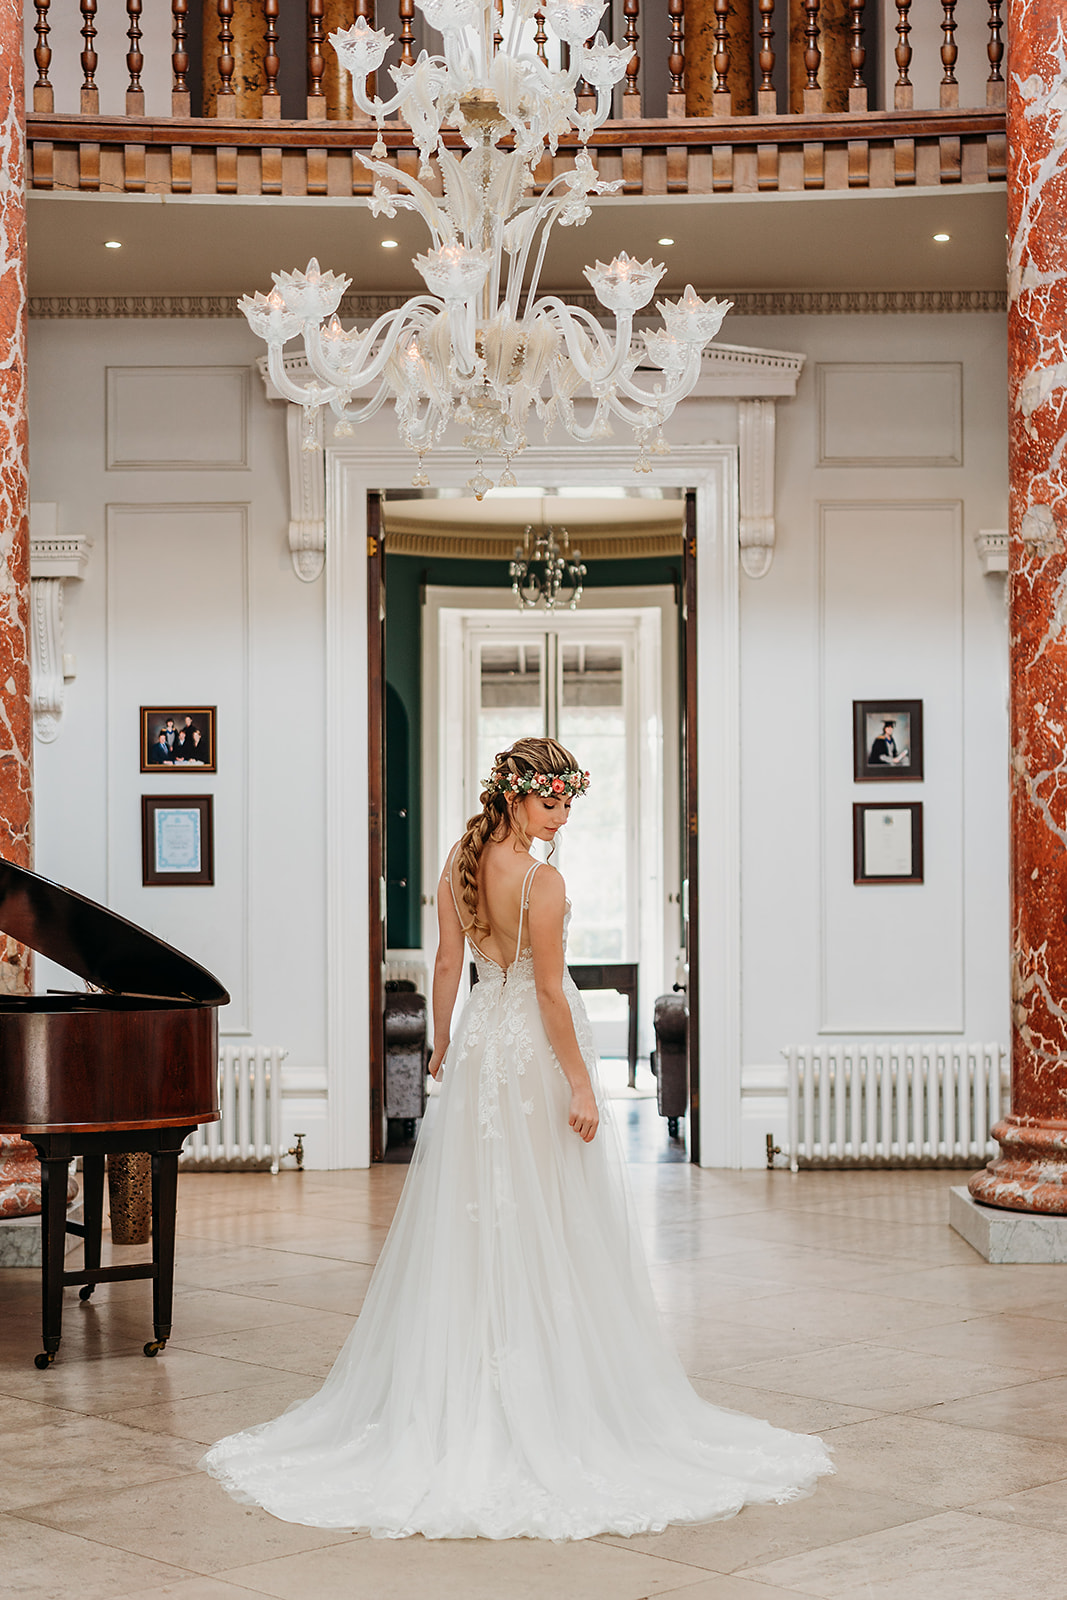 Fillongley Hall - entrance Hallway with dramatic Inonic columns with bride - exclusive weddings - wedding ceremonies - warwickshire wedding venue